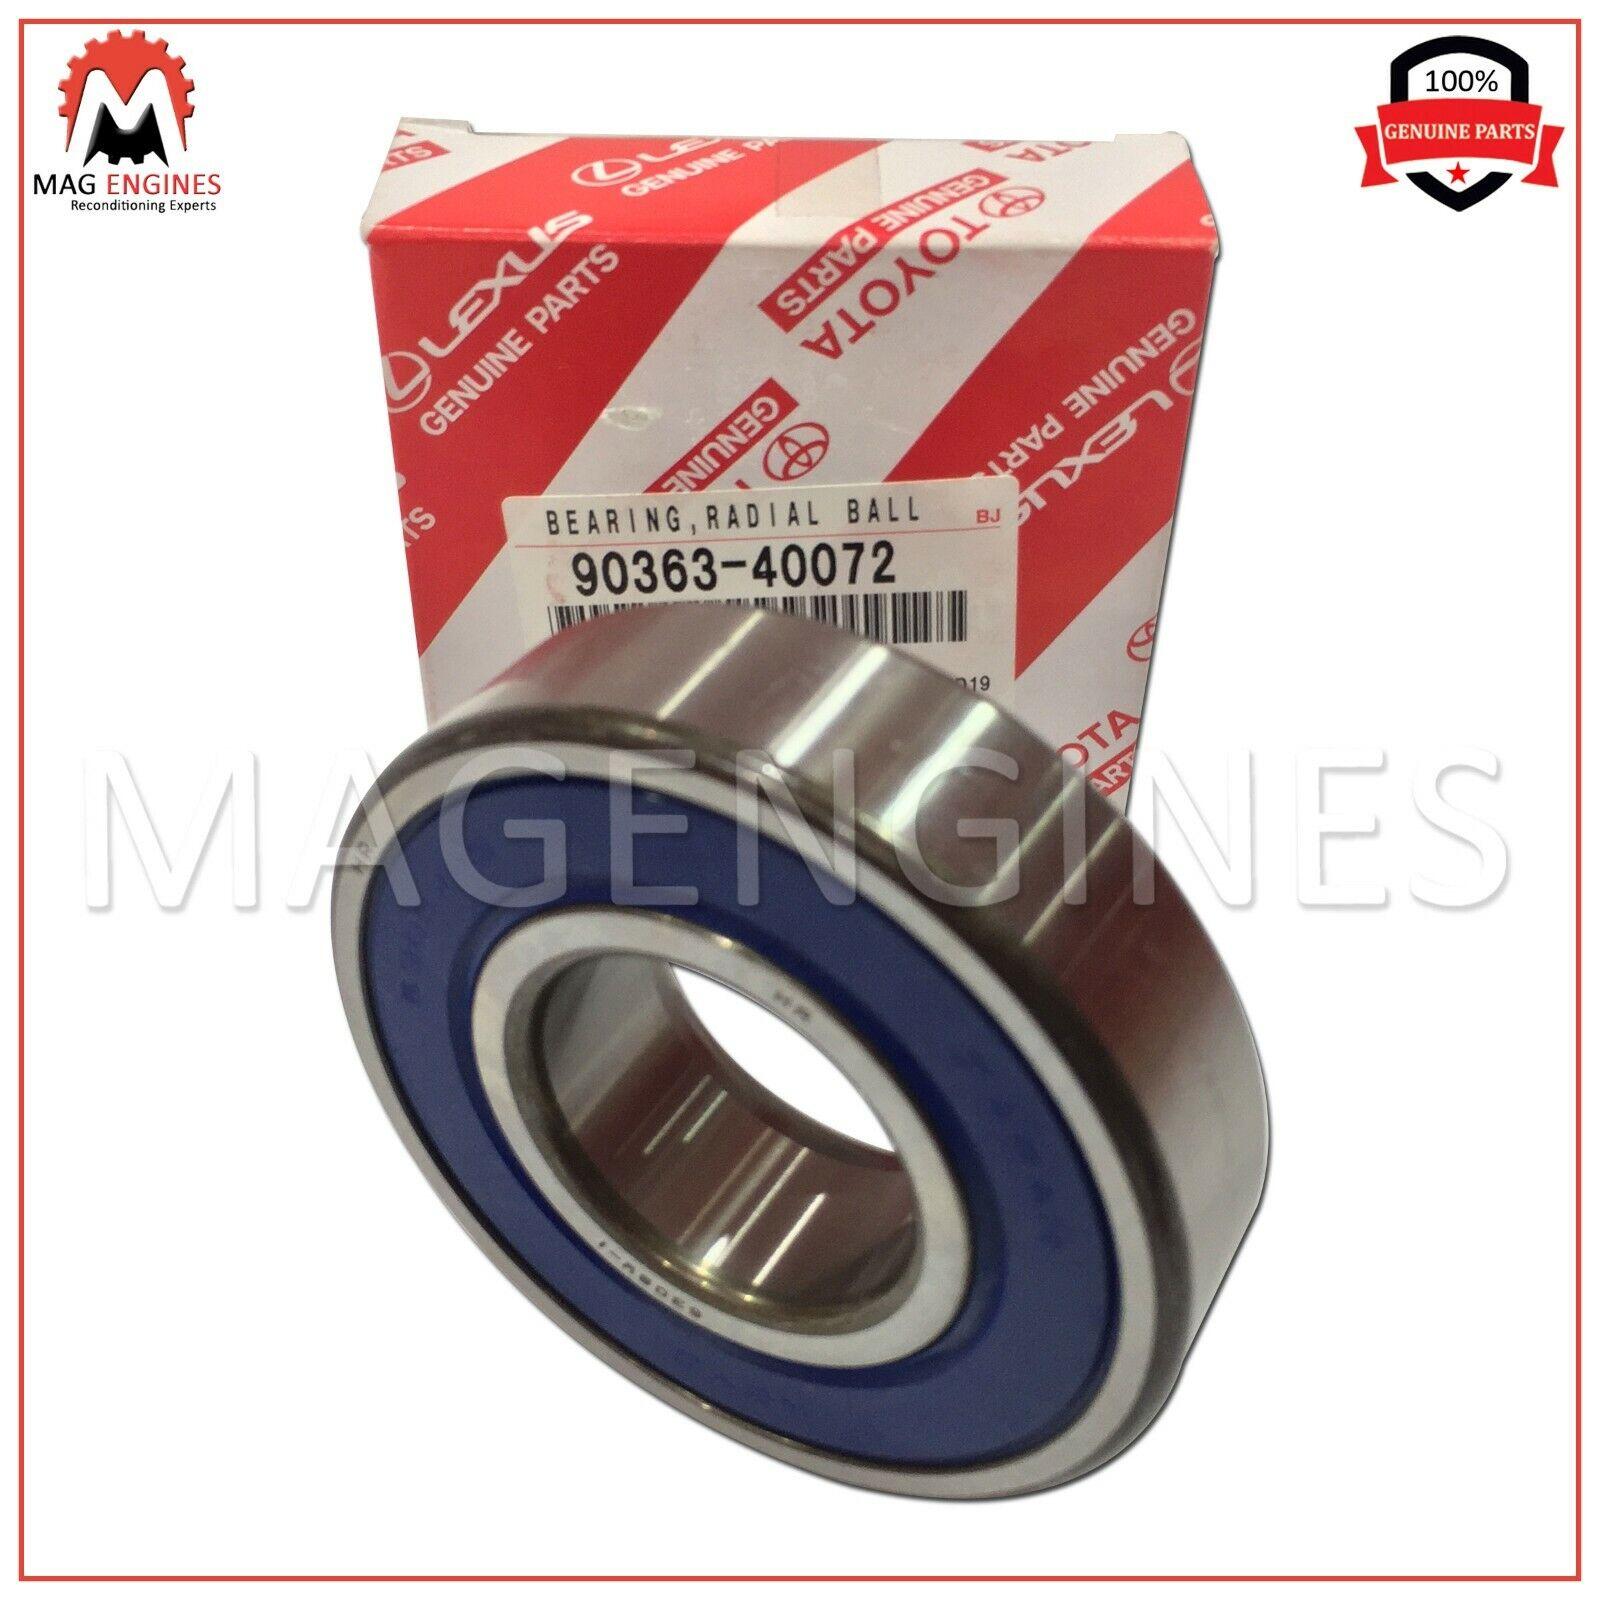 RH//LH 90363-40072 FOR REAR AXLE SHAFT 9036340072 Genuine Toyota BEARING